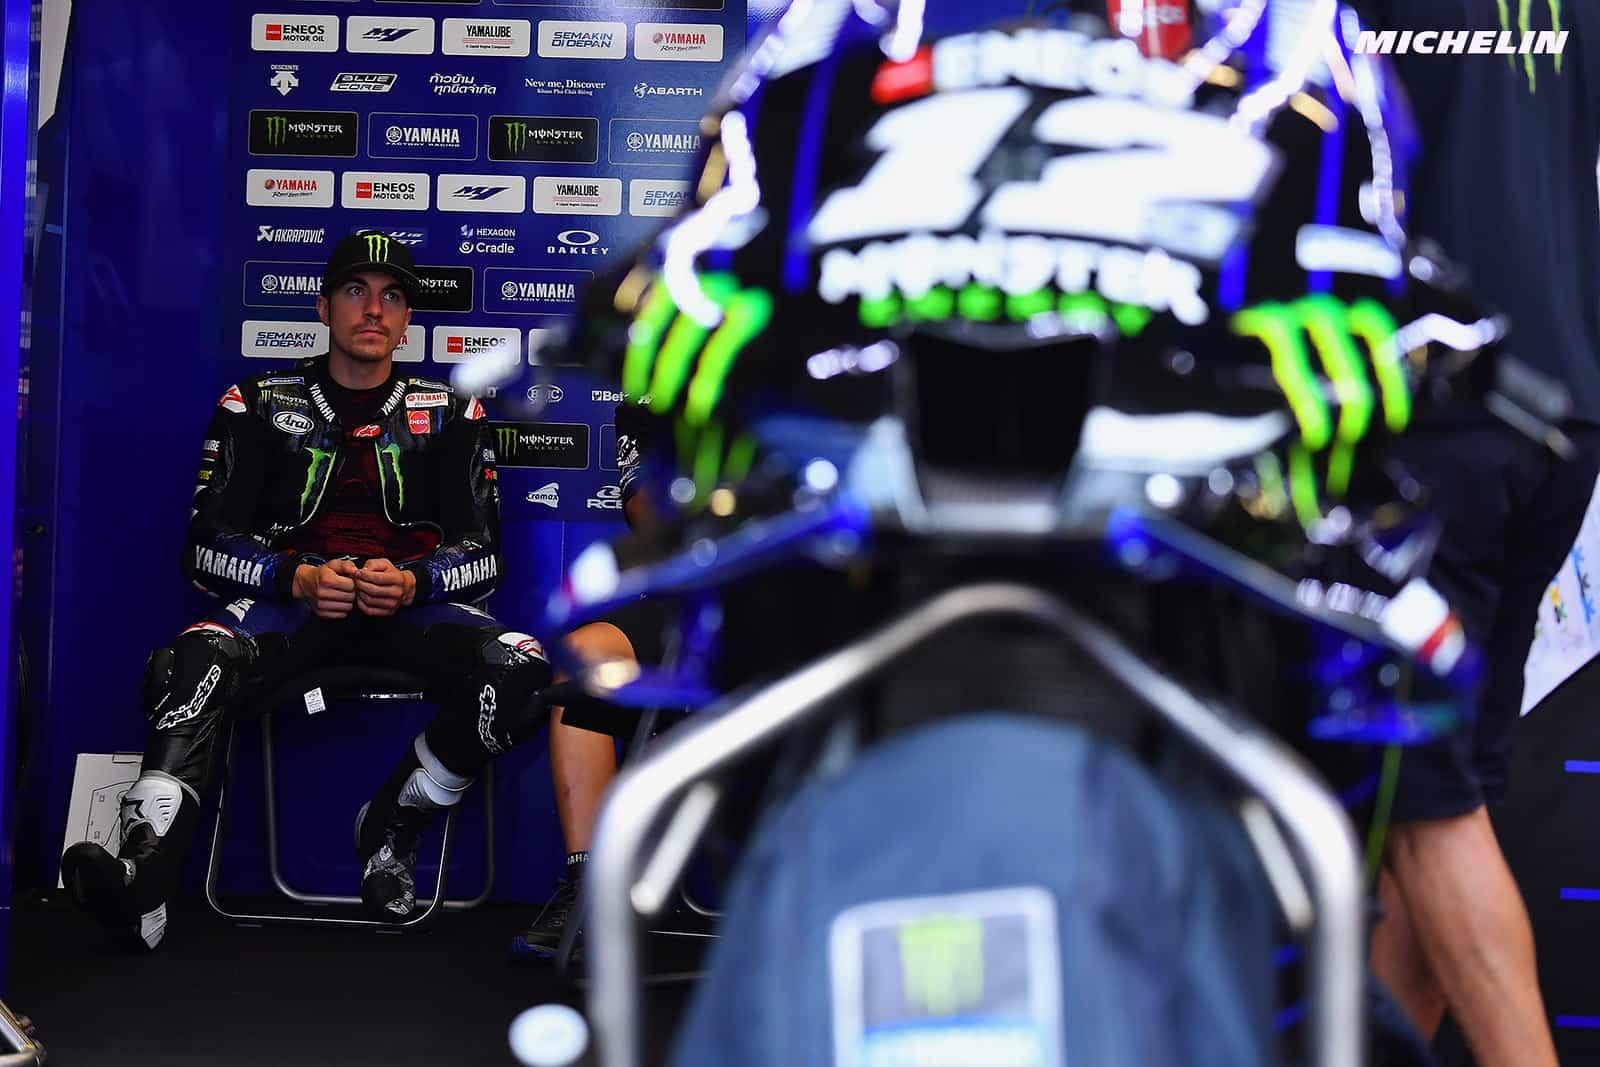 MotoGP2021 ビニャーレス離脱により混迷を深める、ヤマハMotoGP陣営